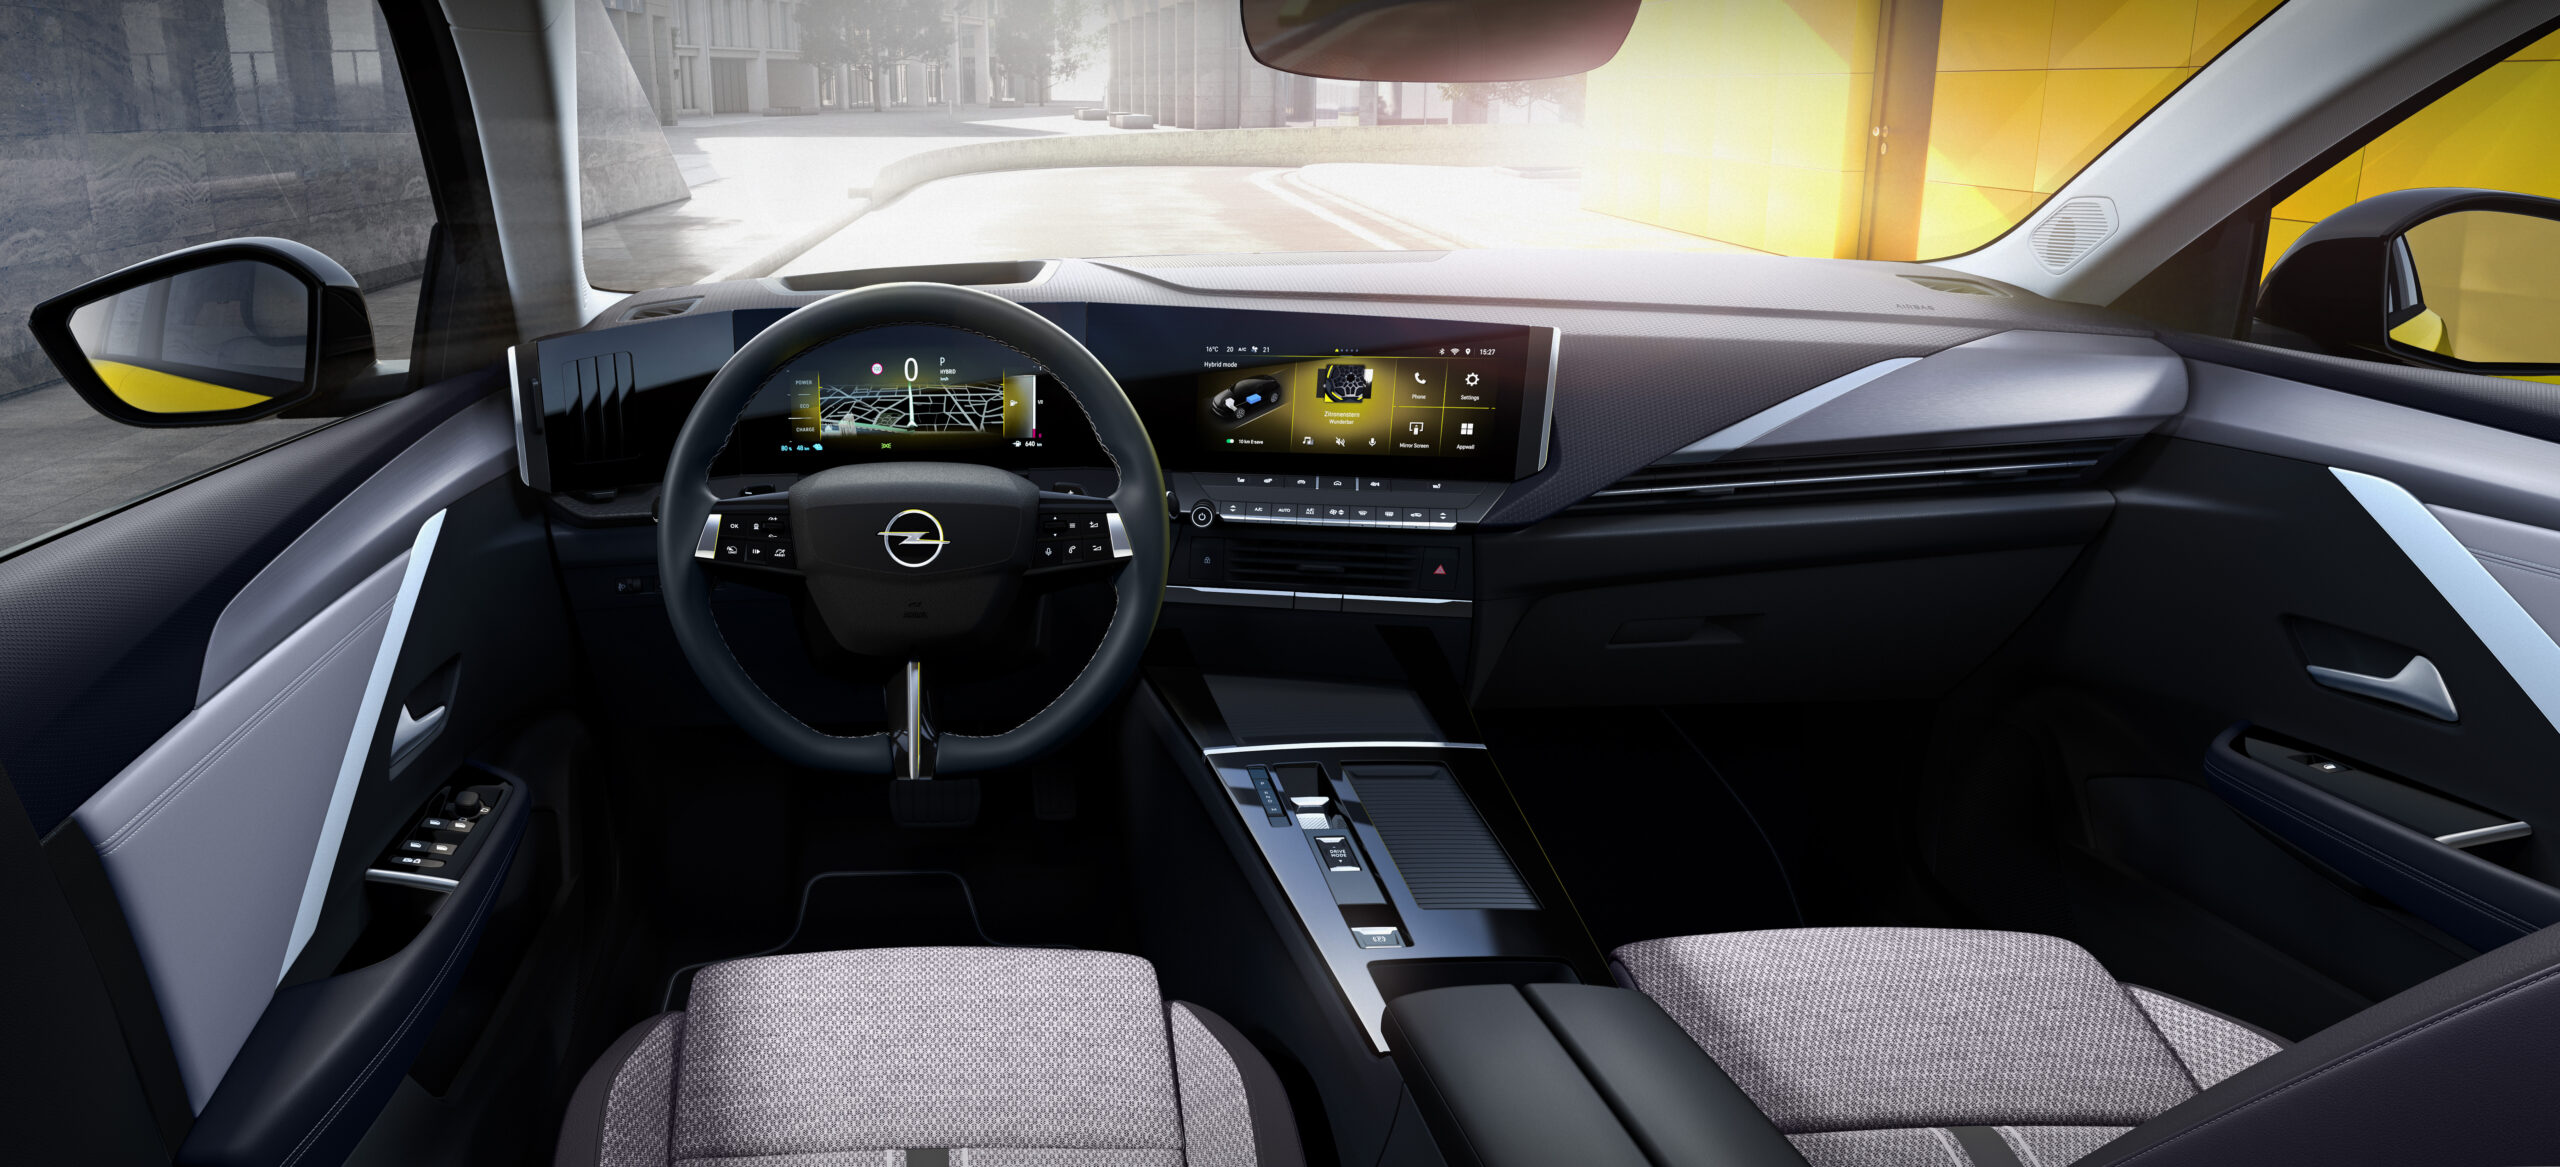 Oto nowy Opel Astra 2022